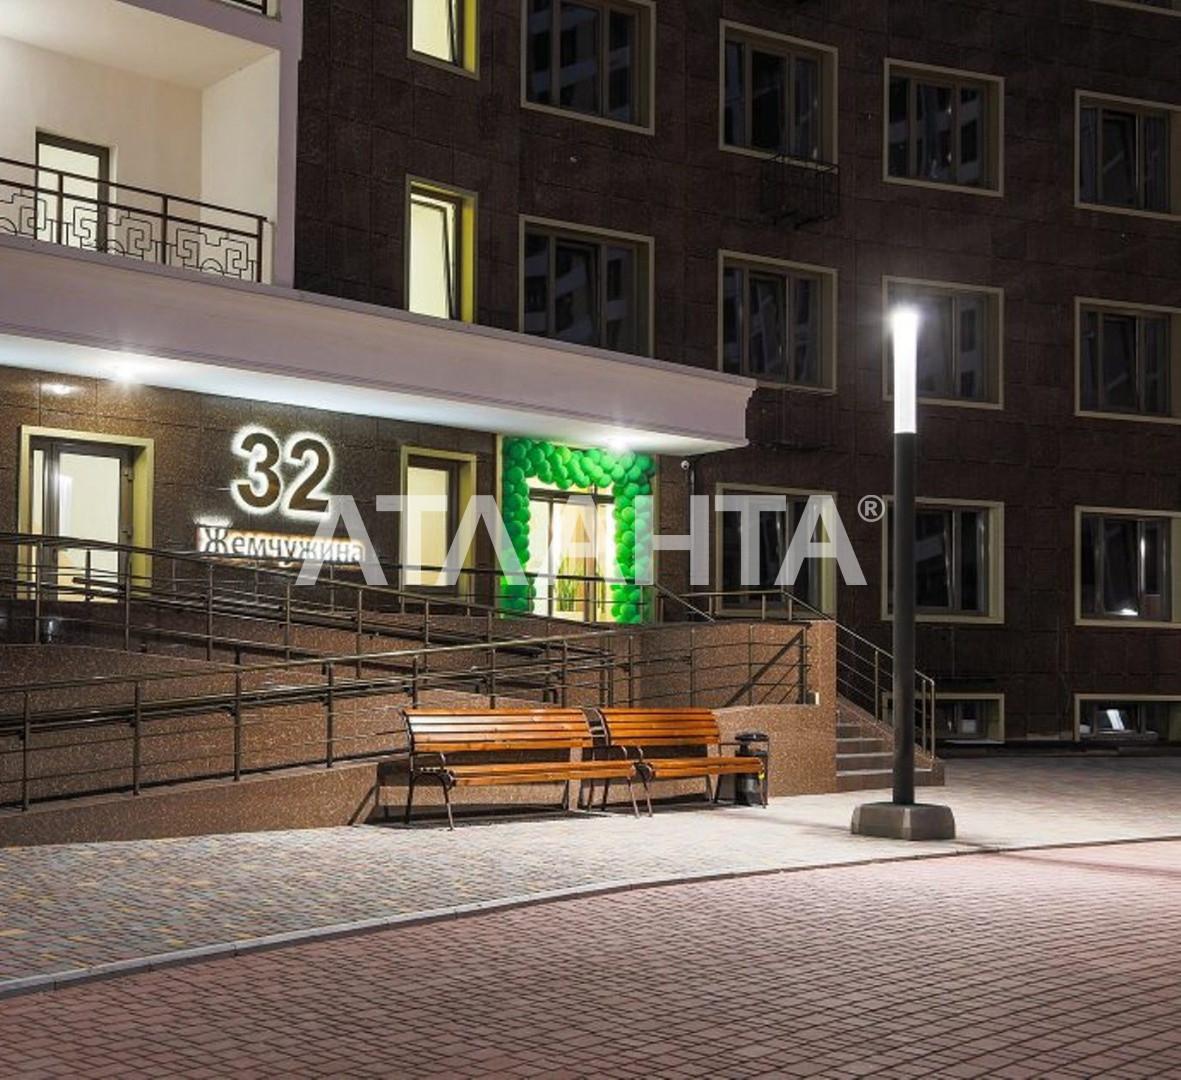 Продается 1-комнатная Квартира на ул. Каманина — 38 500 у.е.